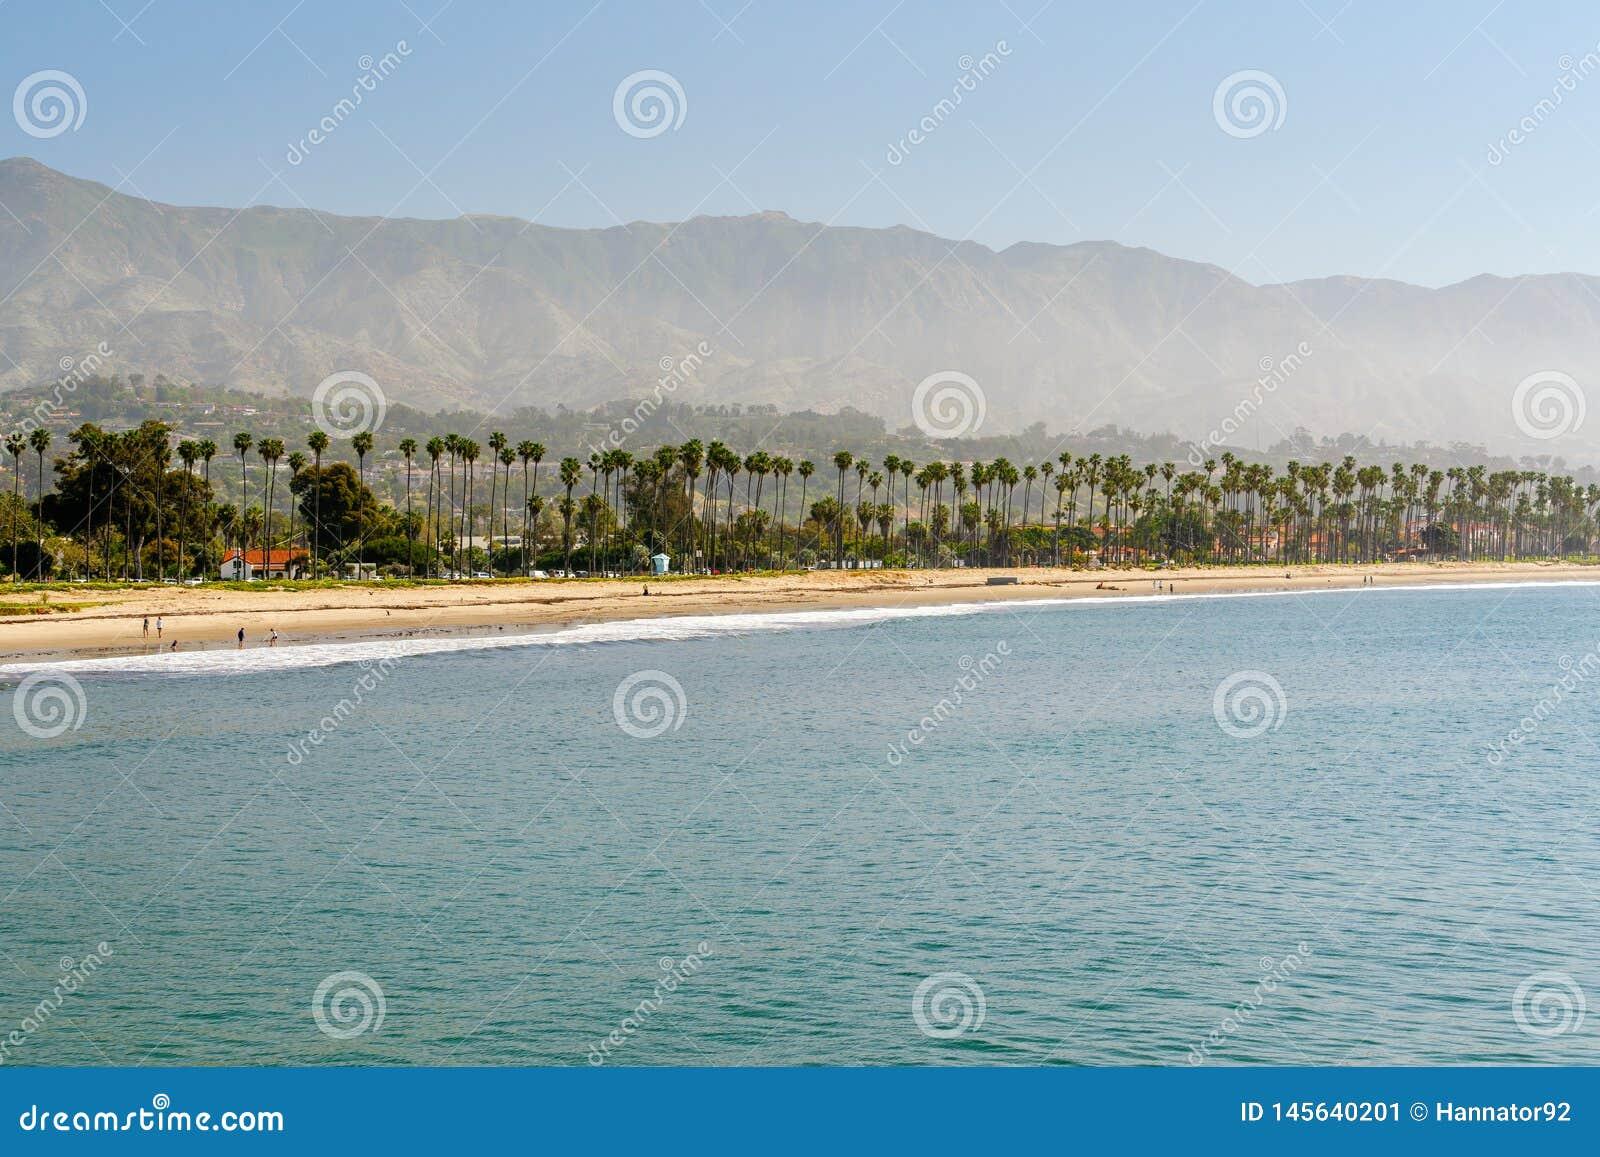 Santa Barbara Beach, Californië Ochtendtijd, Marine Layer